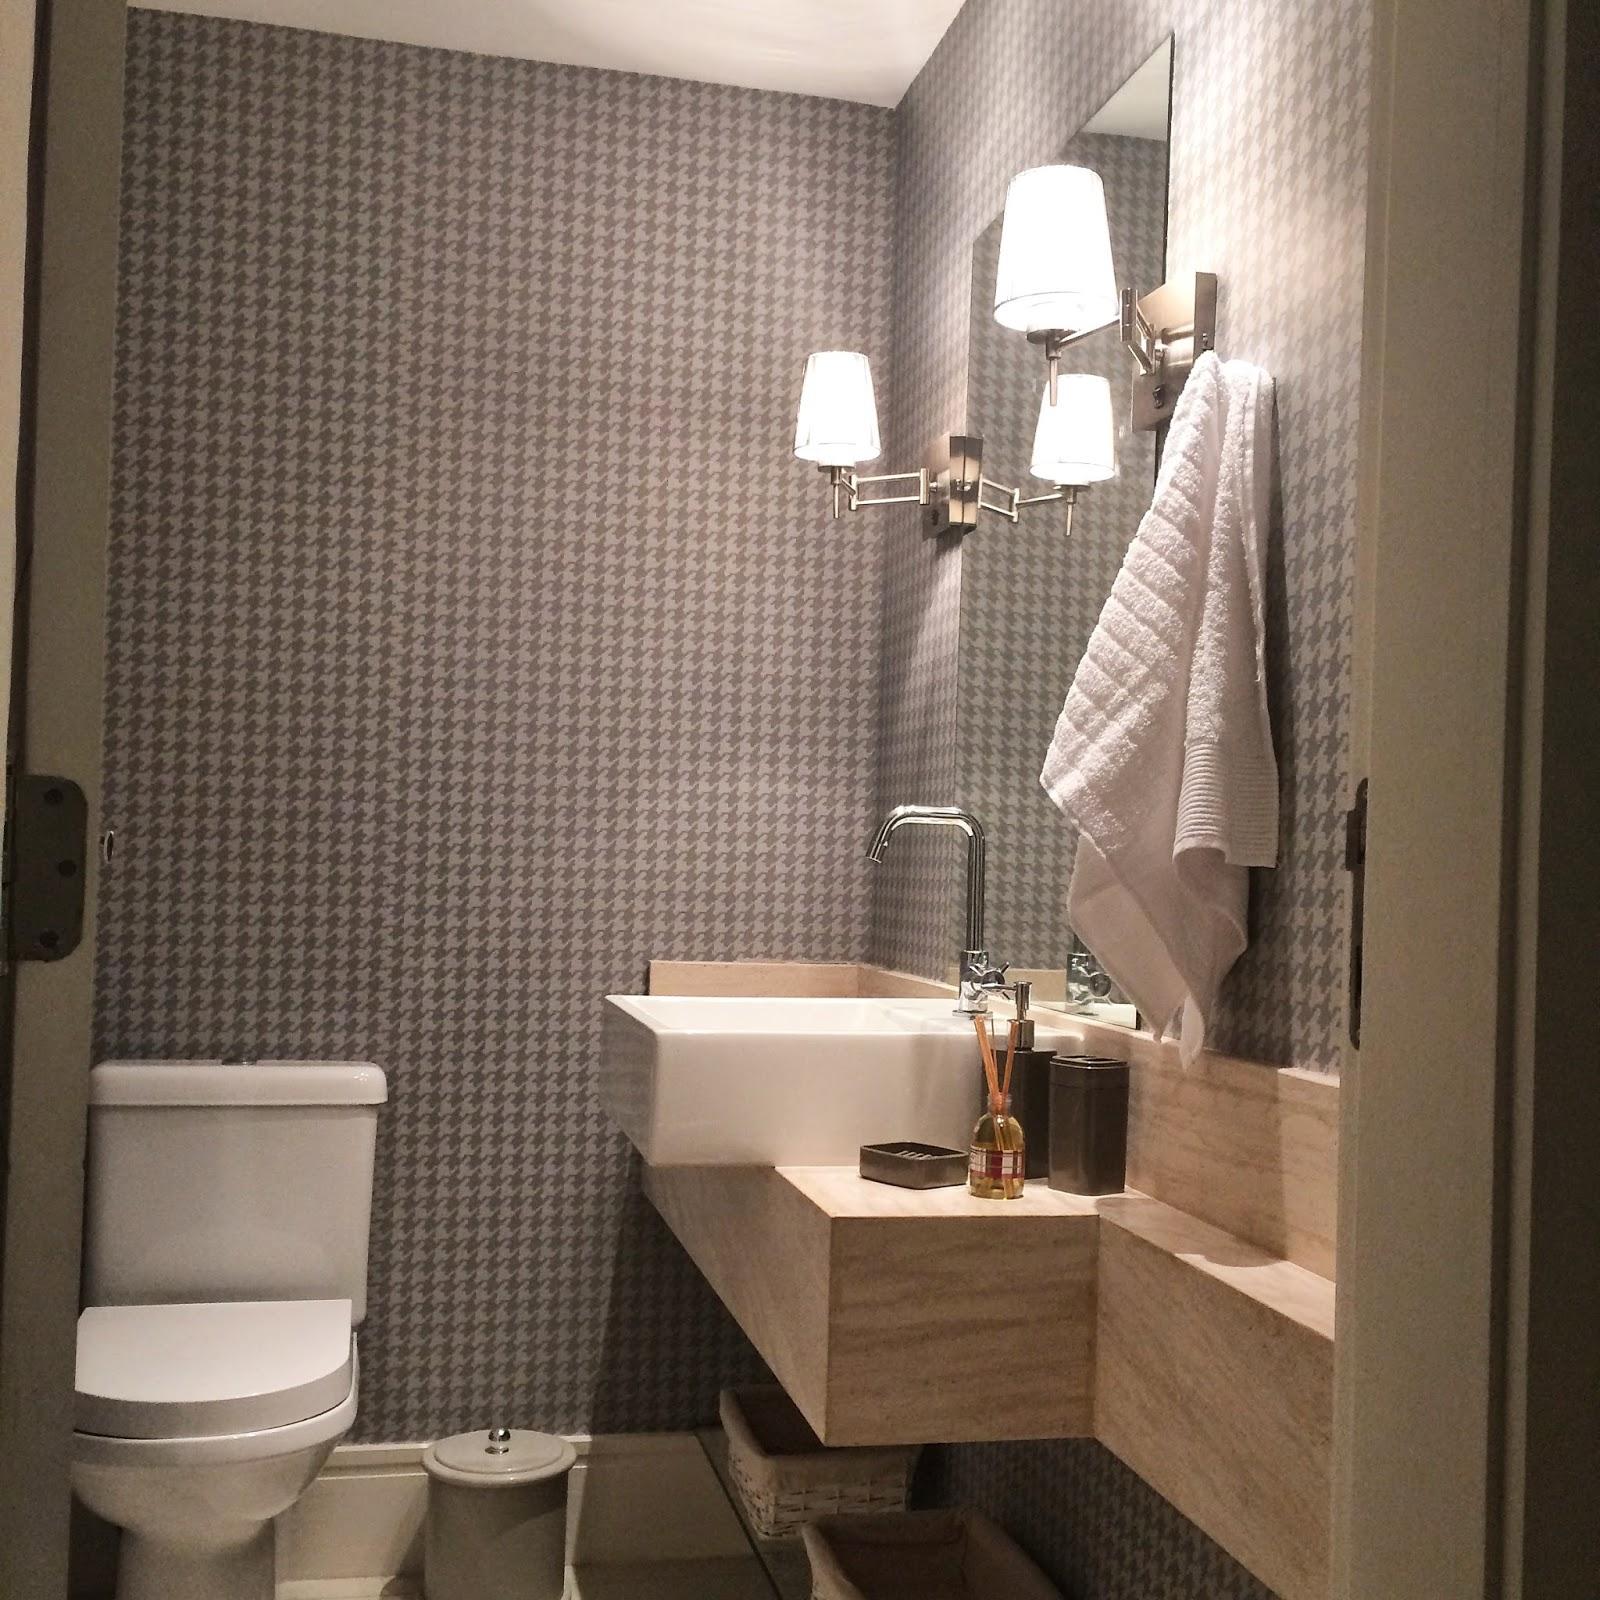 Blog luz design lavabo bacana gastando pouco for Lavabo pequeno leroy merlin